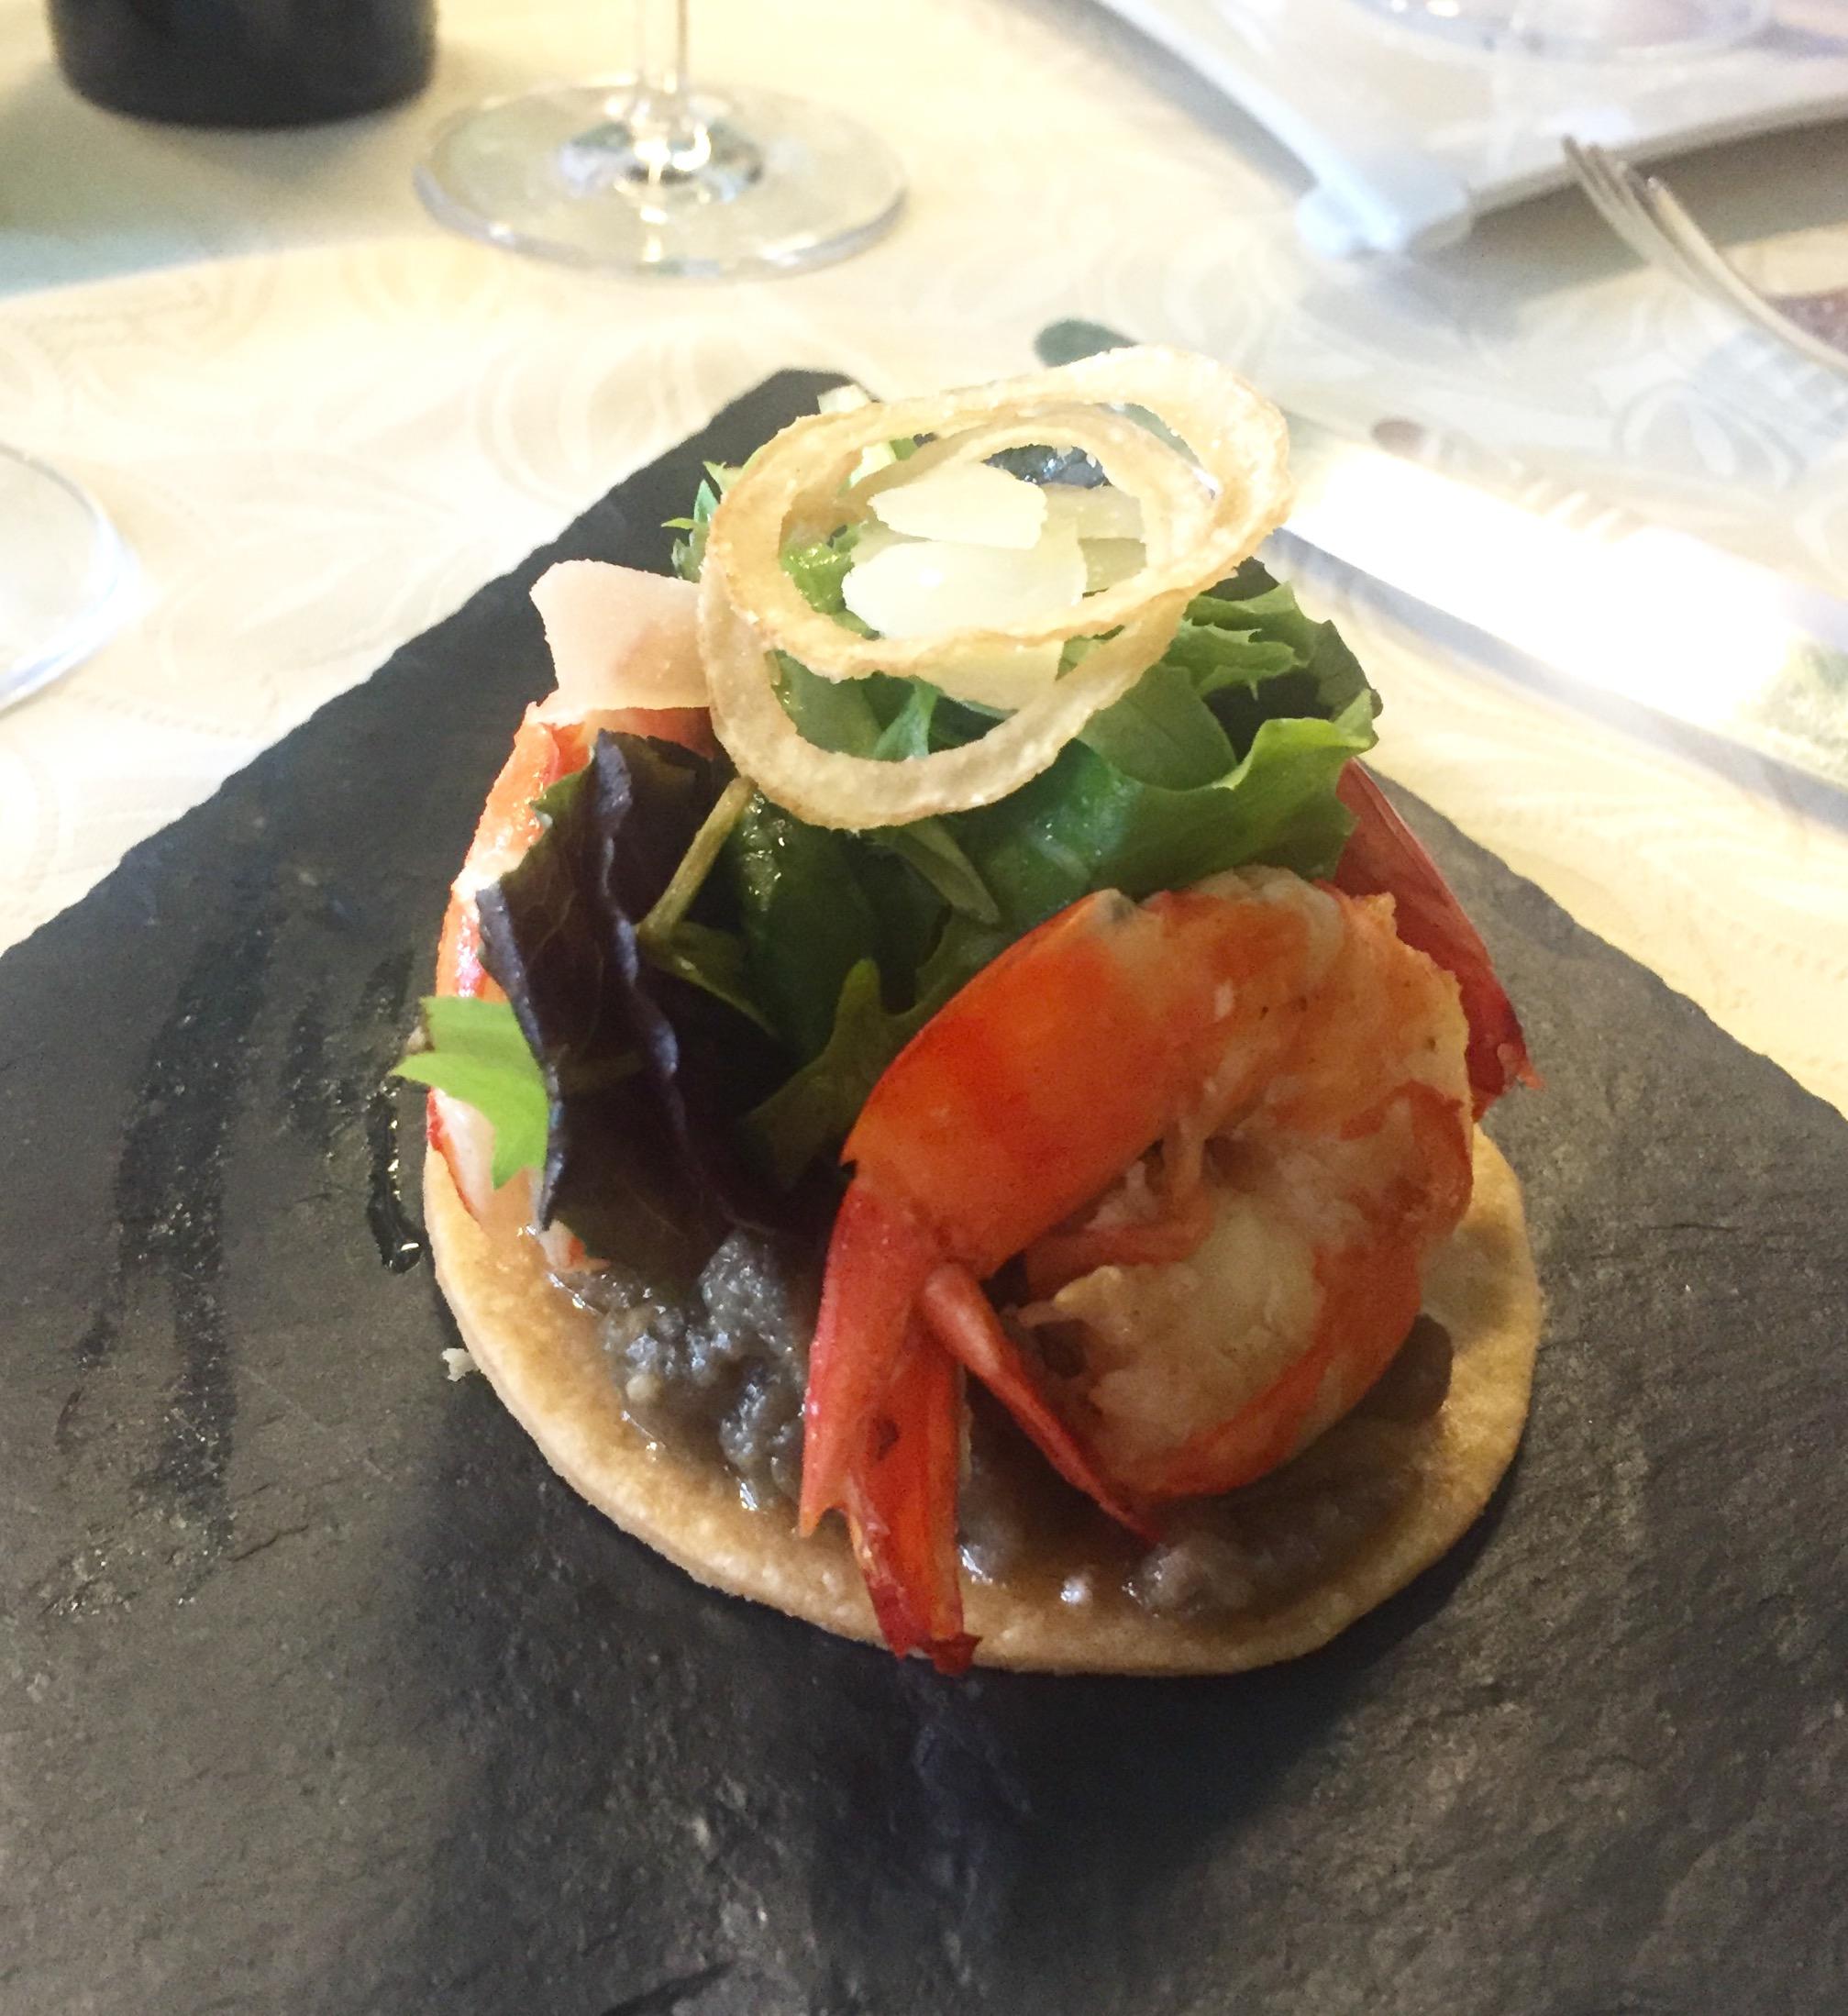 The amazing  La Belle Etoile  restaurant in La Roque-Gageac